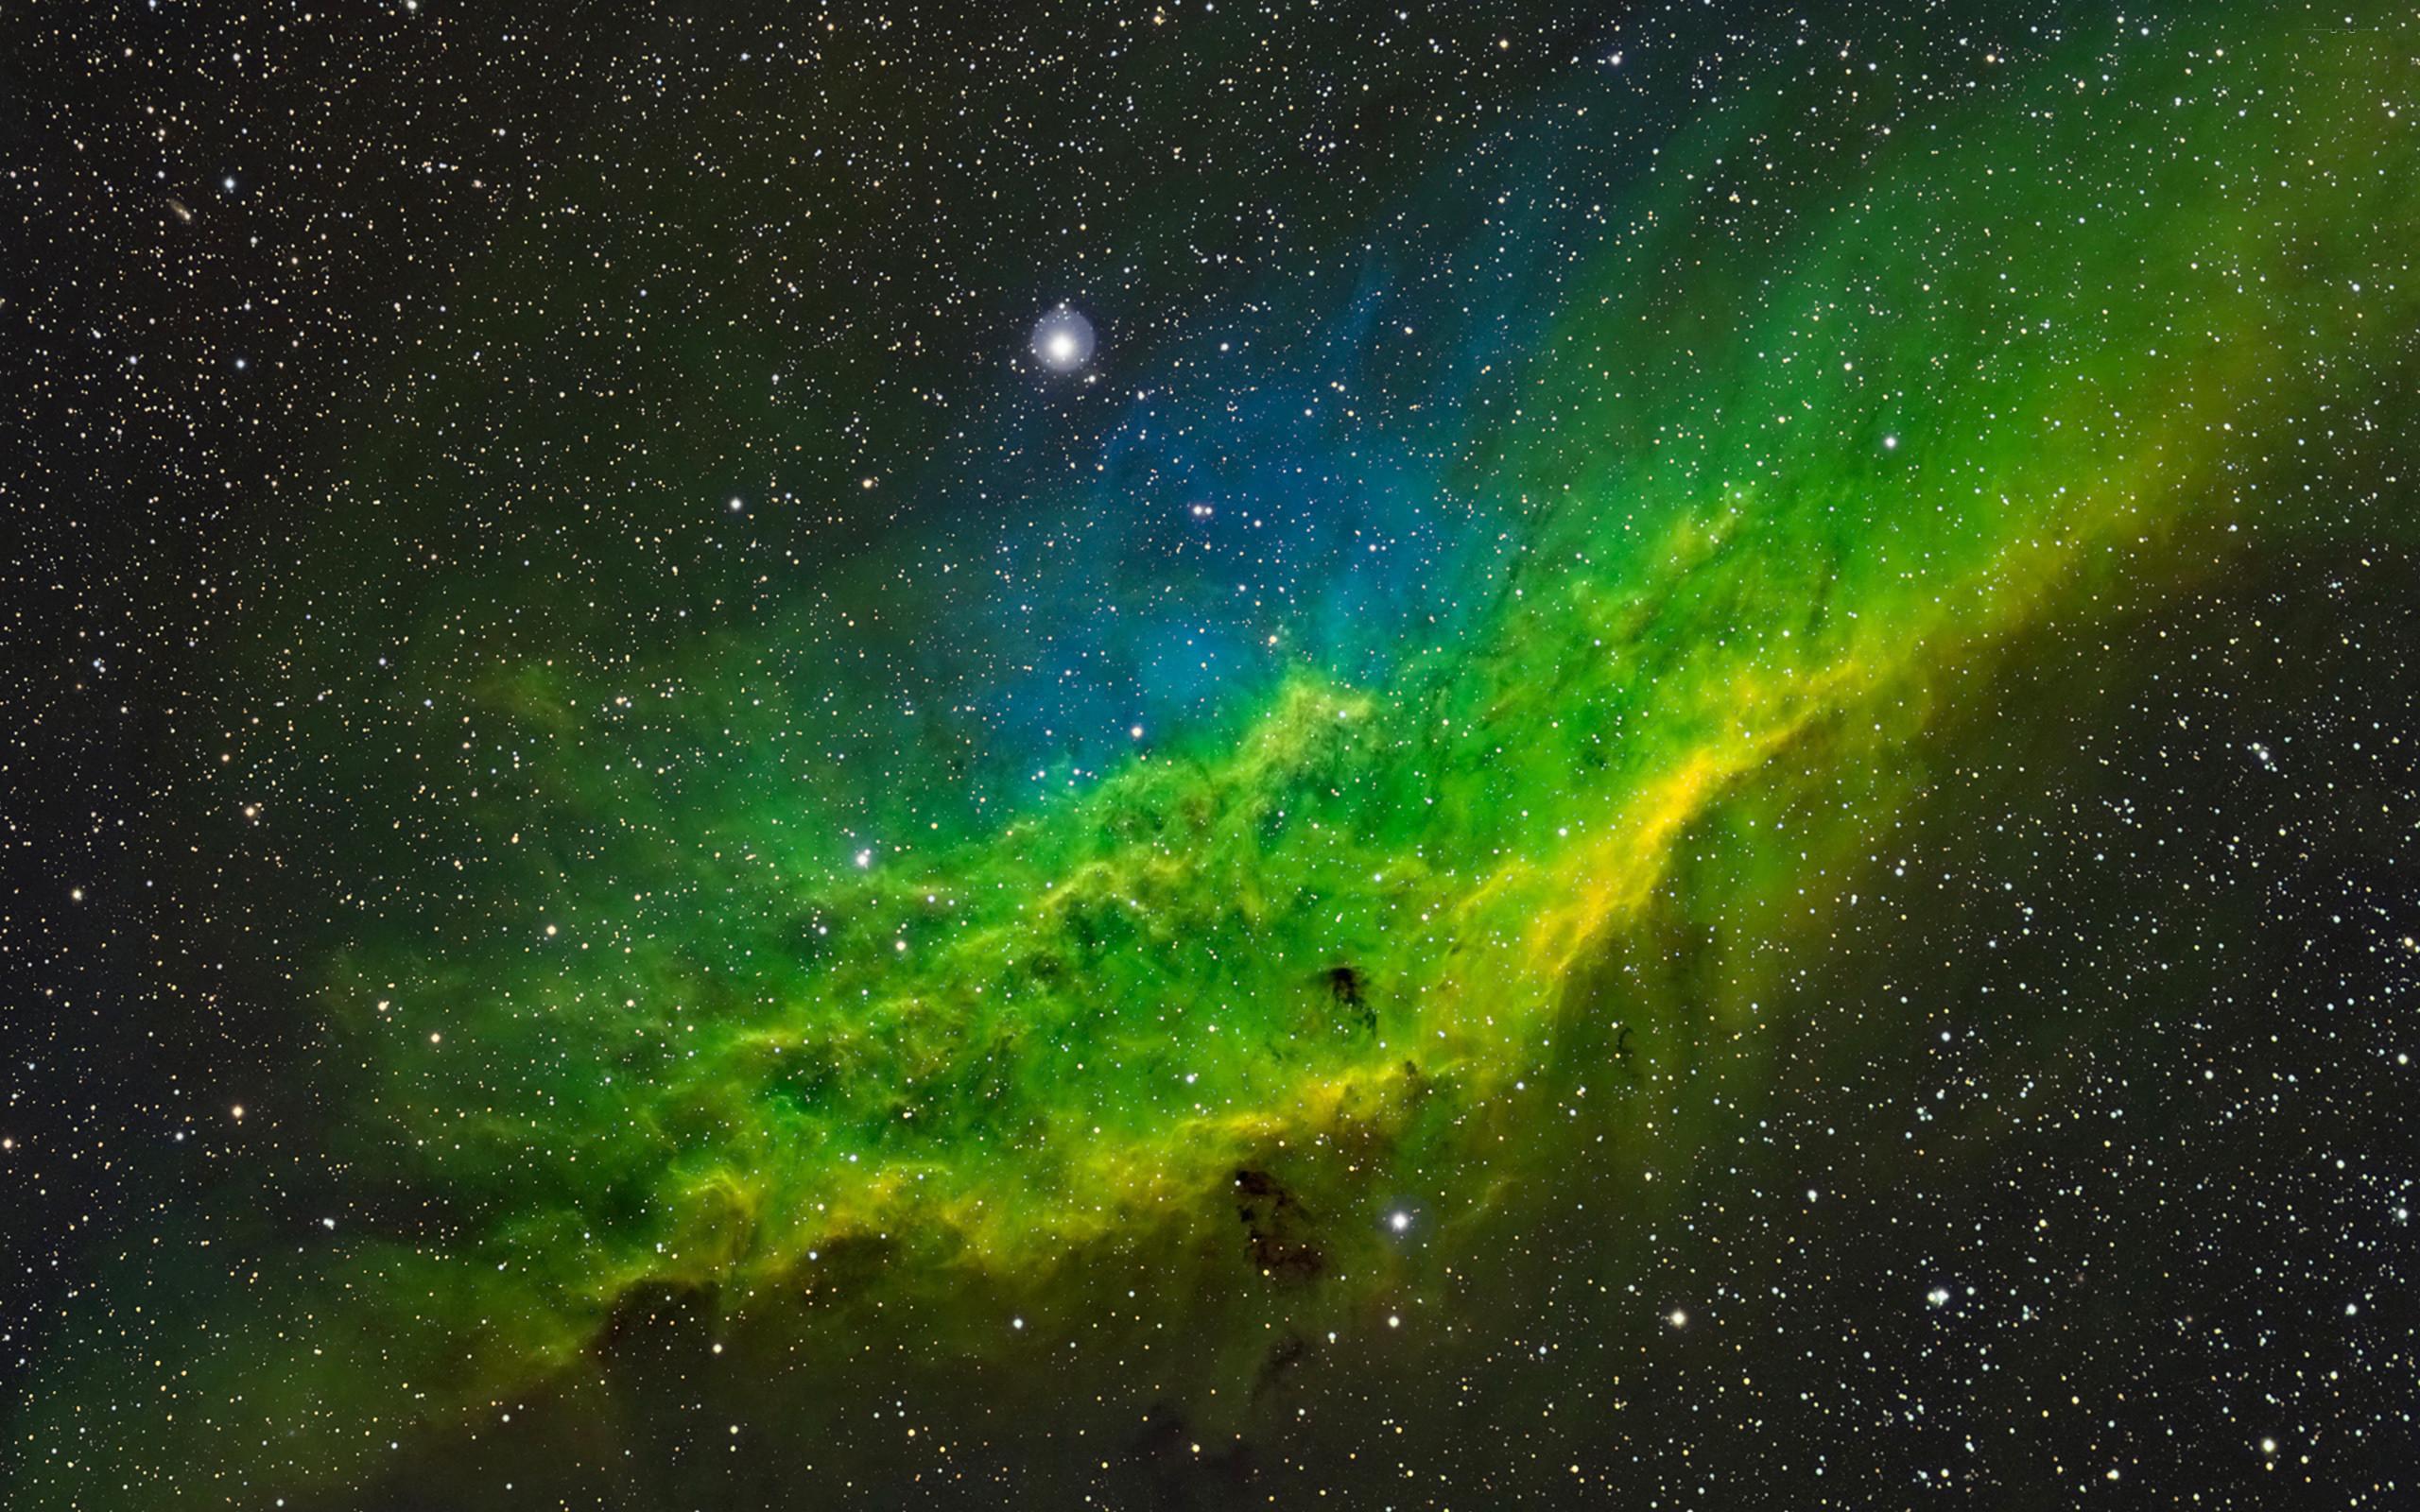 Galaxy Wallpaper Widescreen (74+ Images